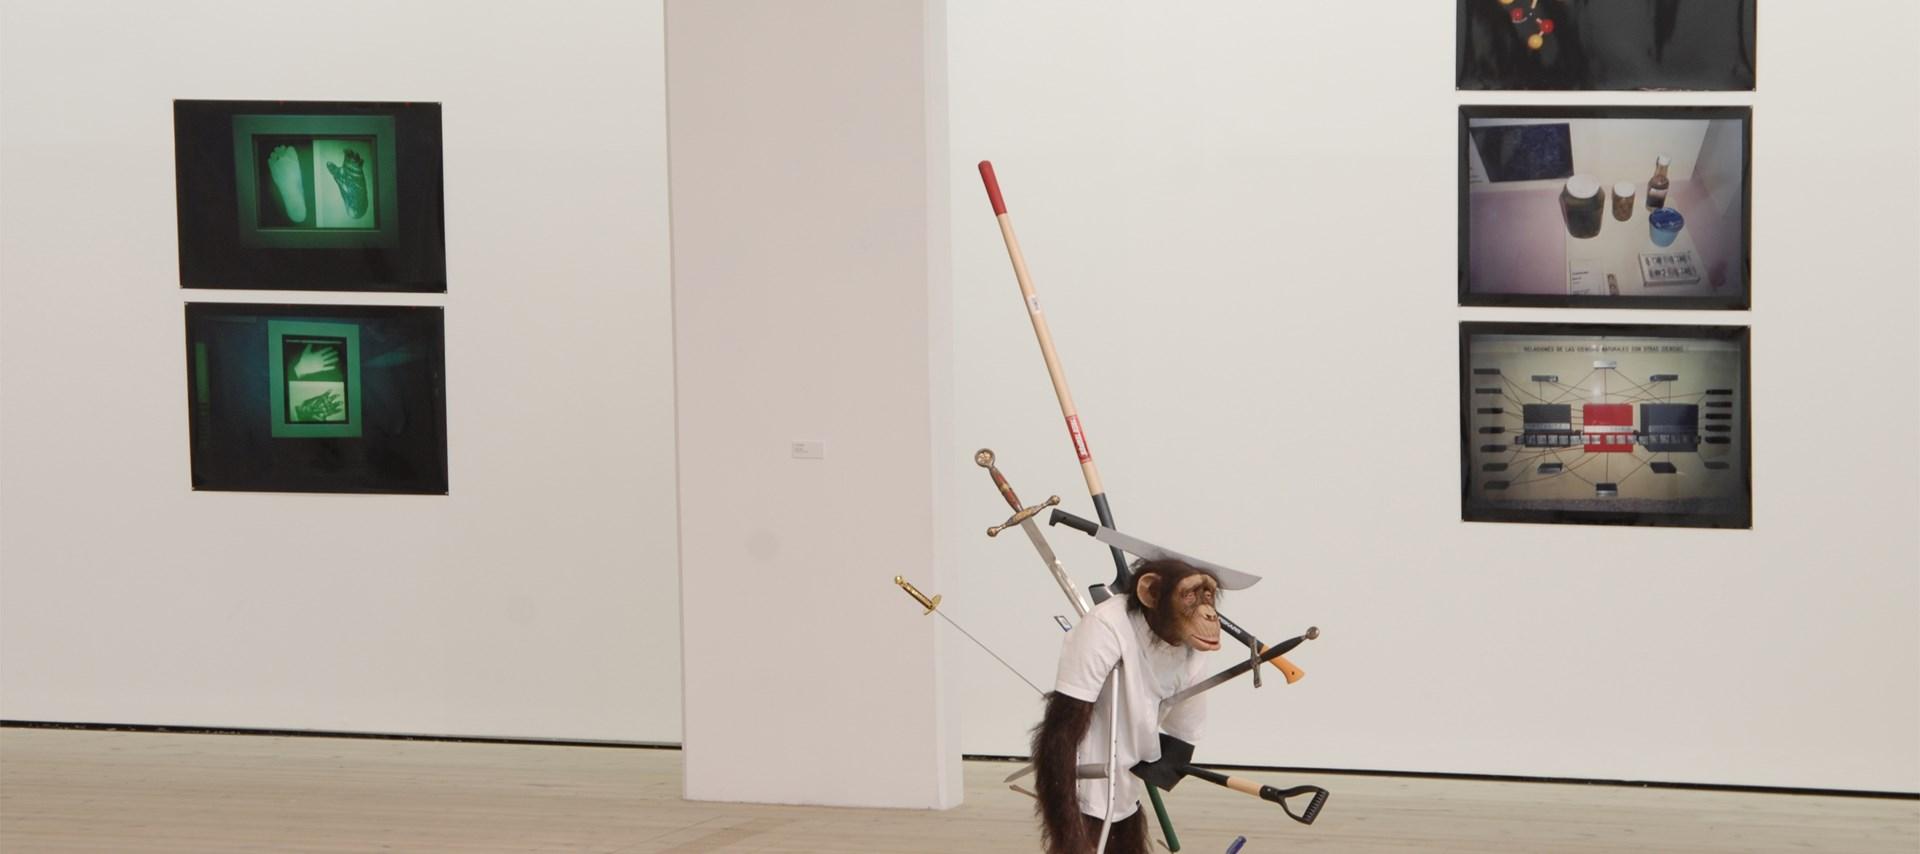 Freak Show - An Unnatural History: Installation shot by Colin Davison